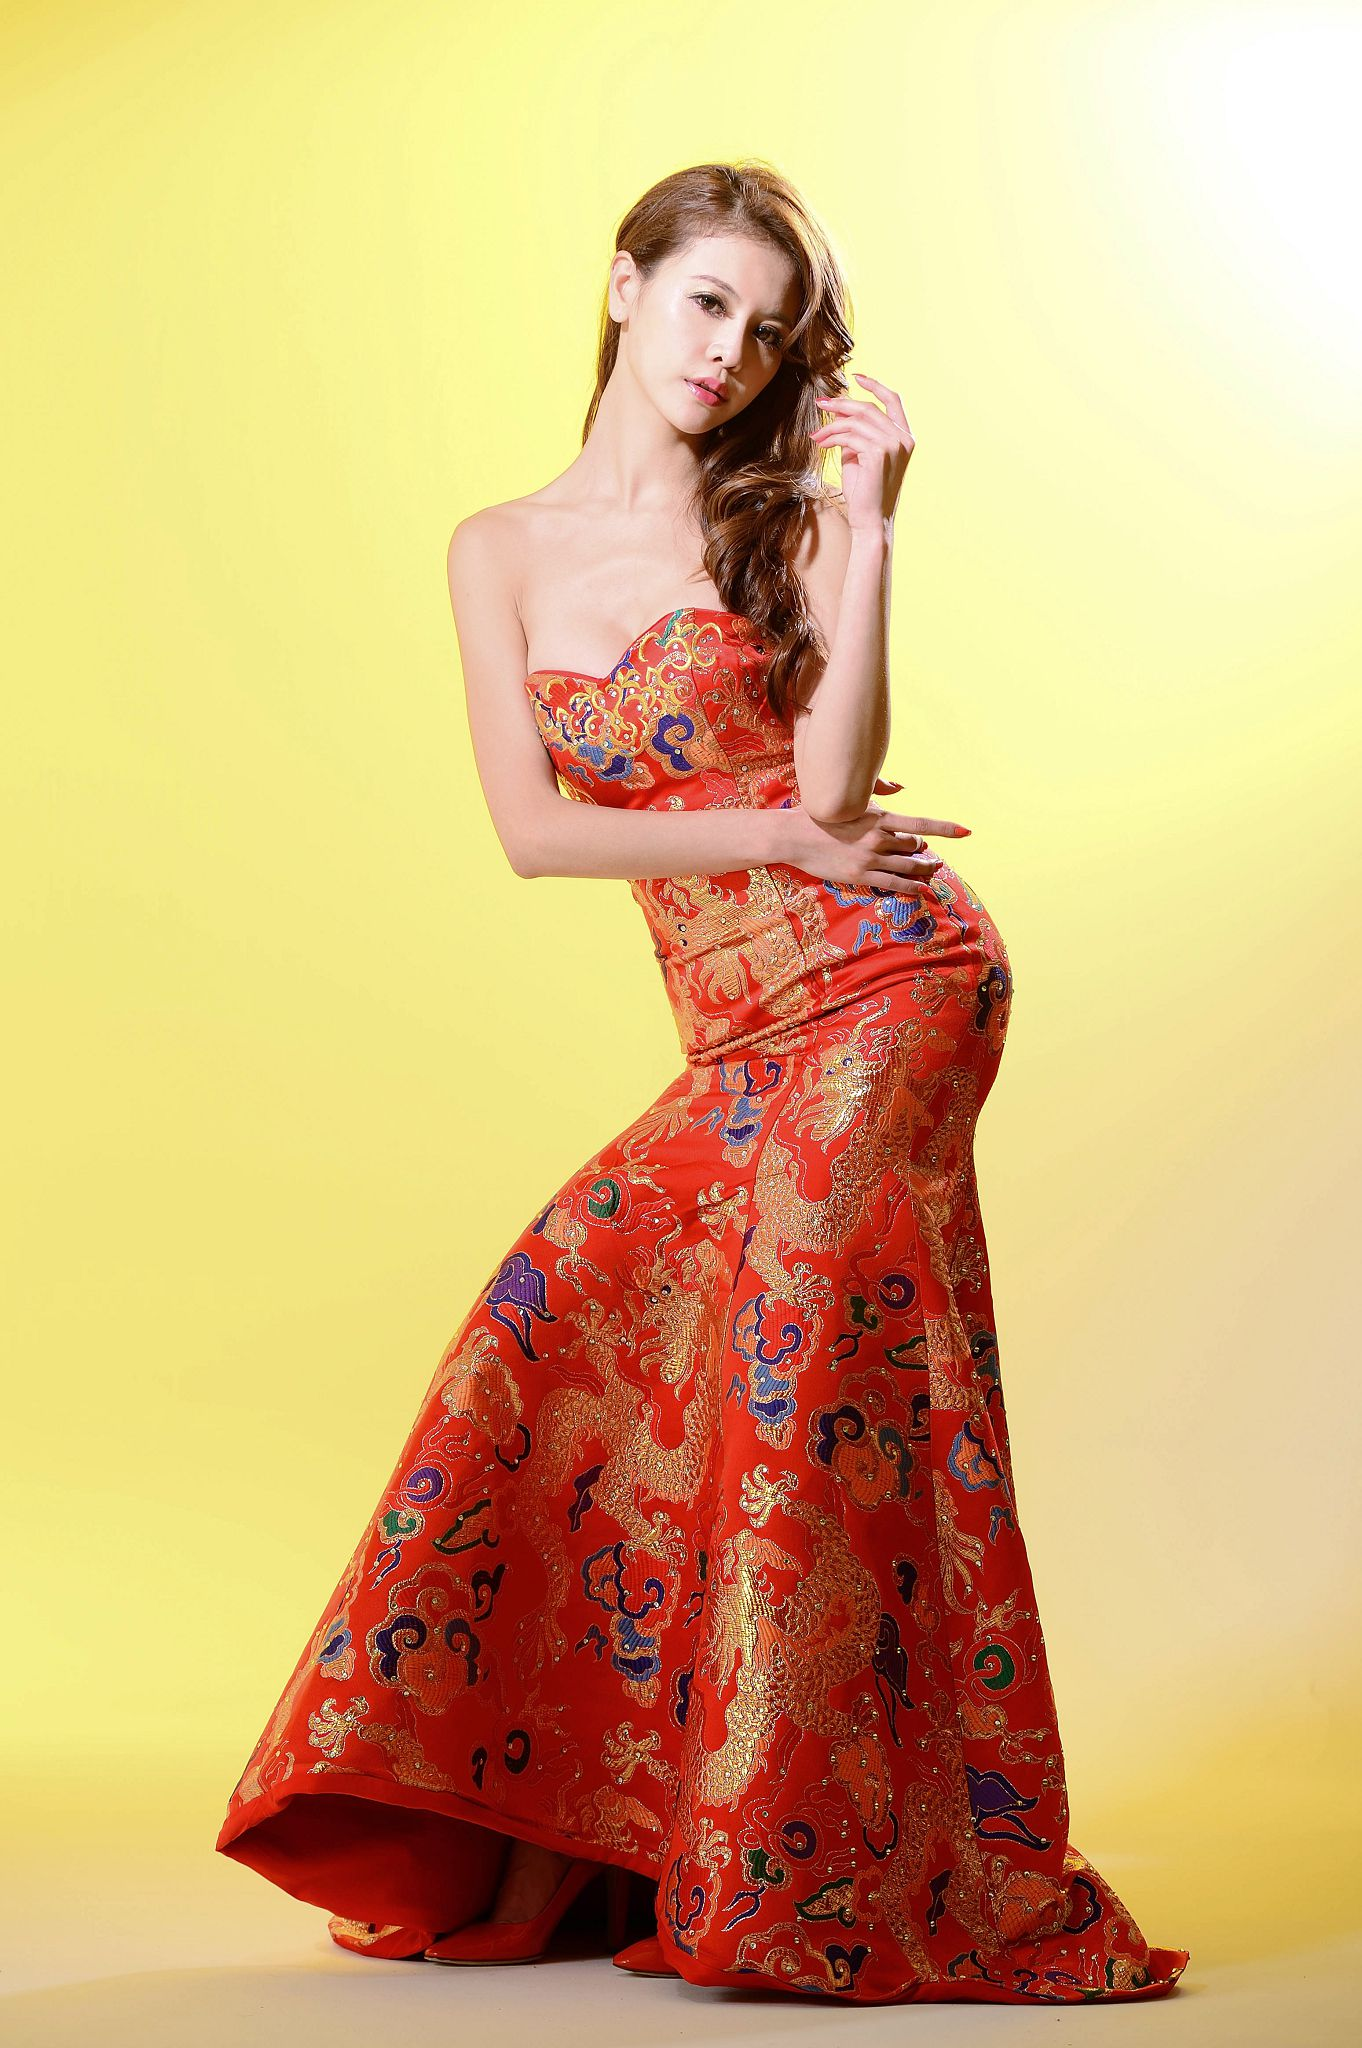 VOL.284 [台湾正妹]长裙气质古典优雅美女:黄雅倚(腿模Dennise)高品质写真套图(52P)